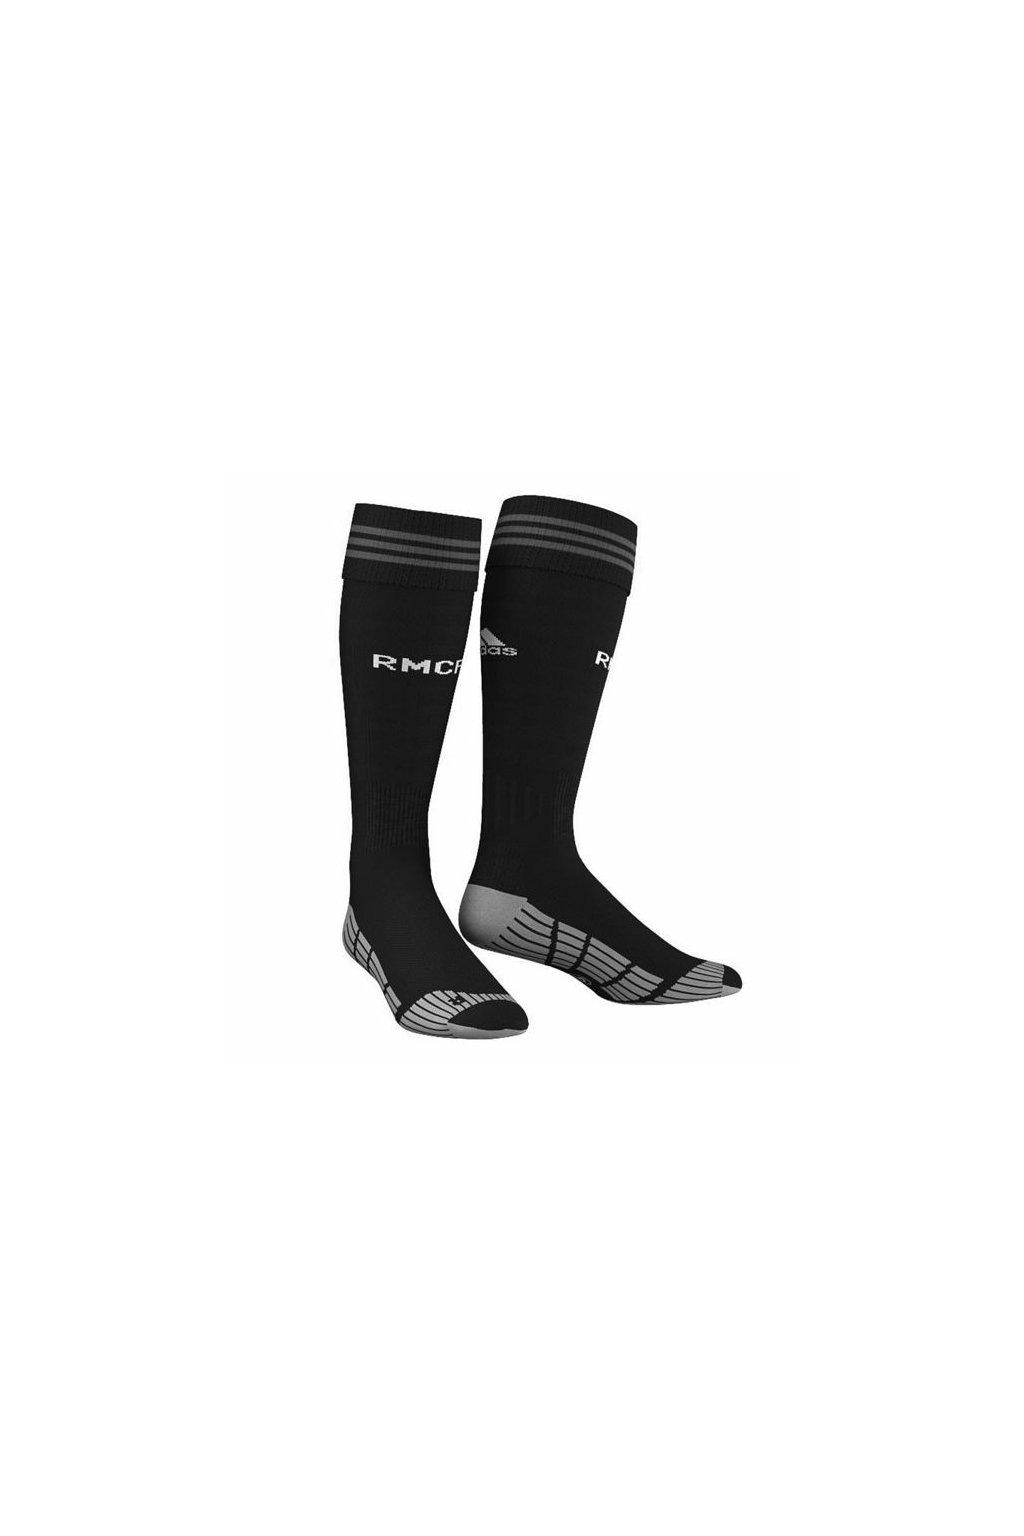 6d002c1a6a3fe ADIDAS REAL MADRID futbalové ponožky, rozmer 34-36 - Fresh sport